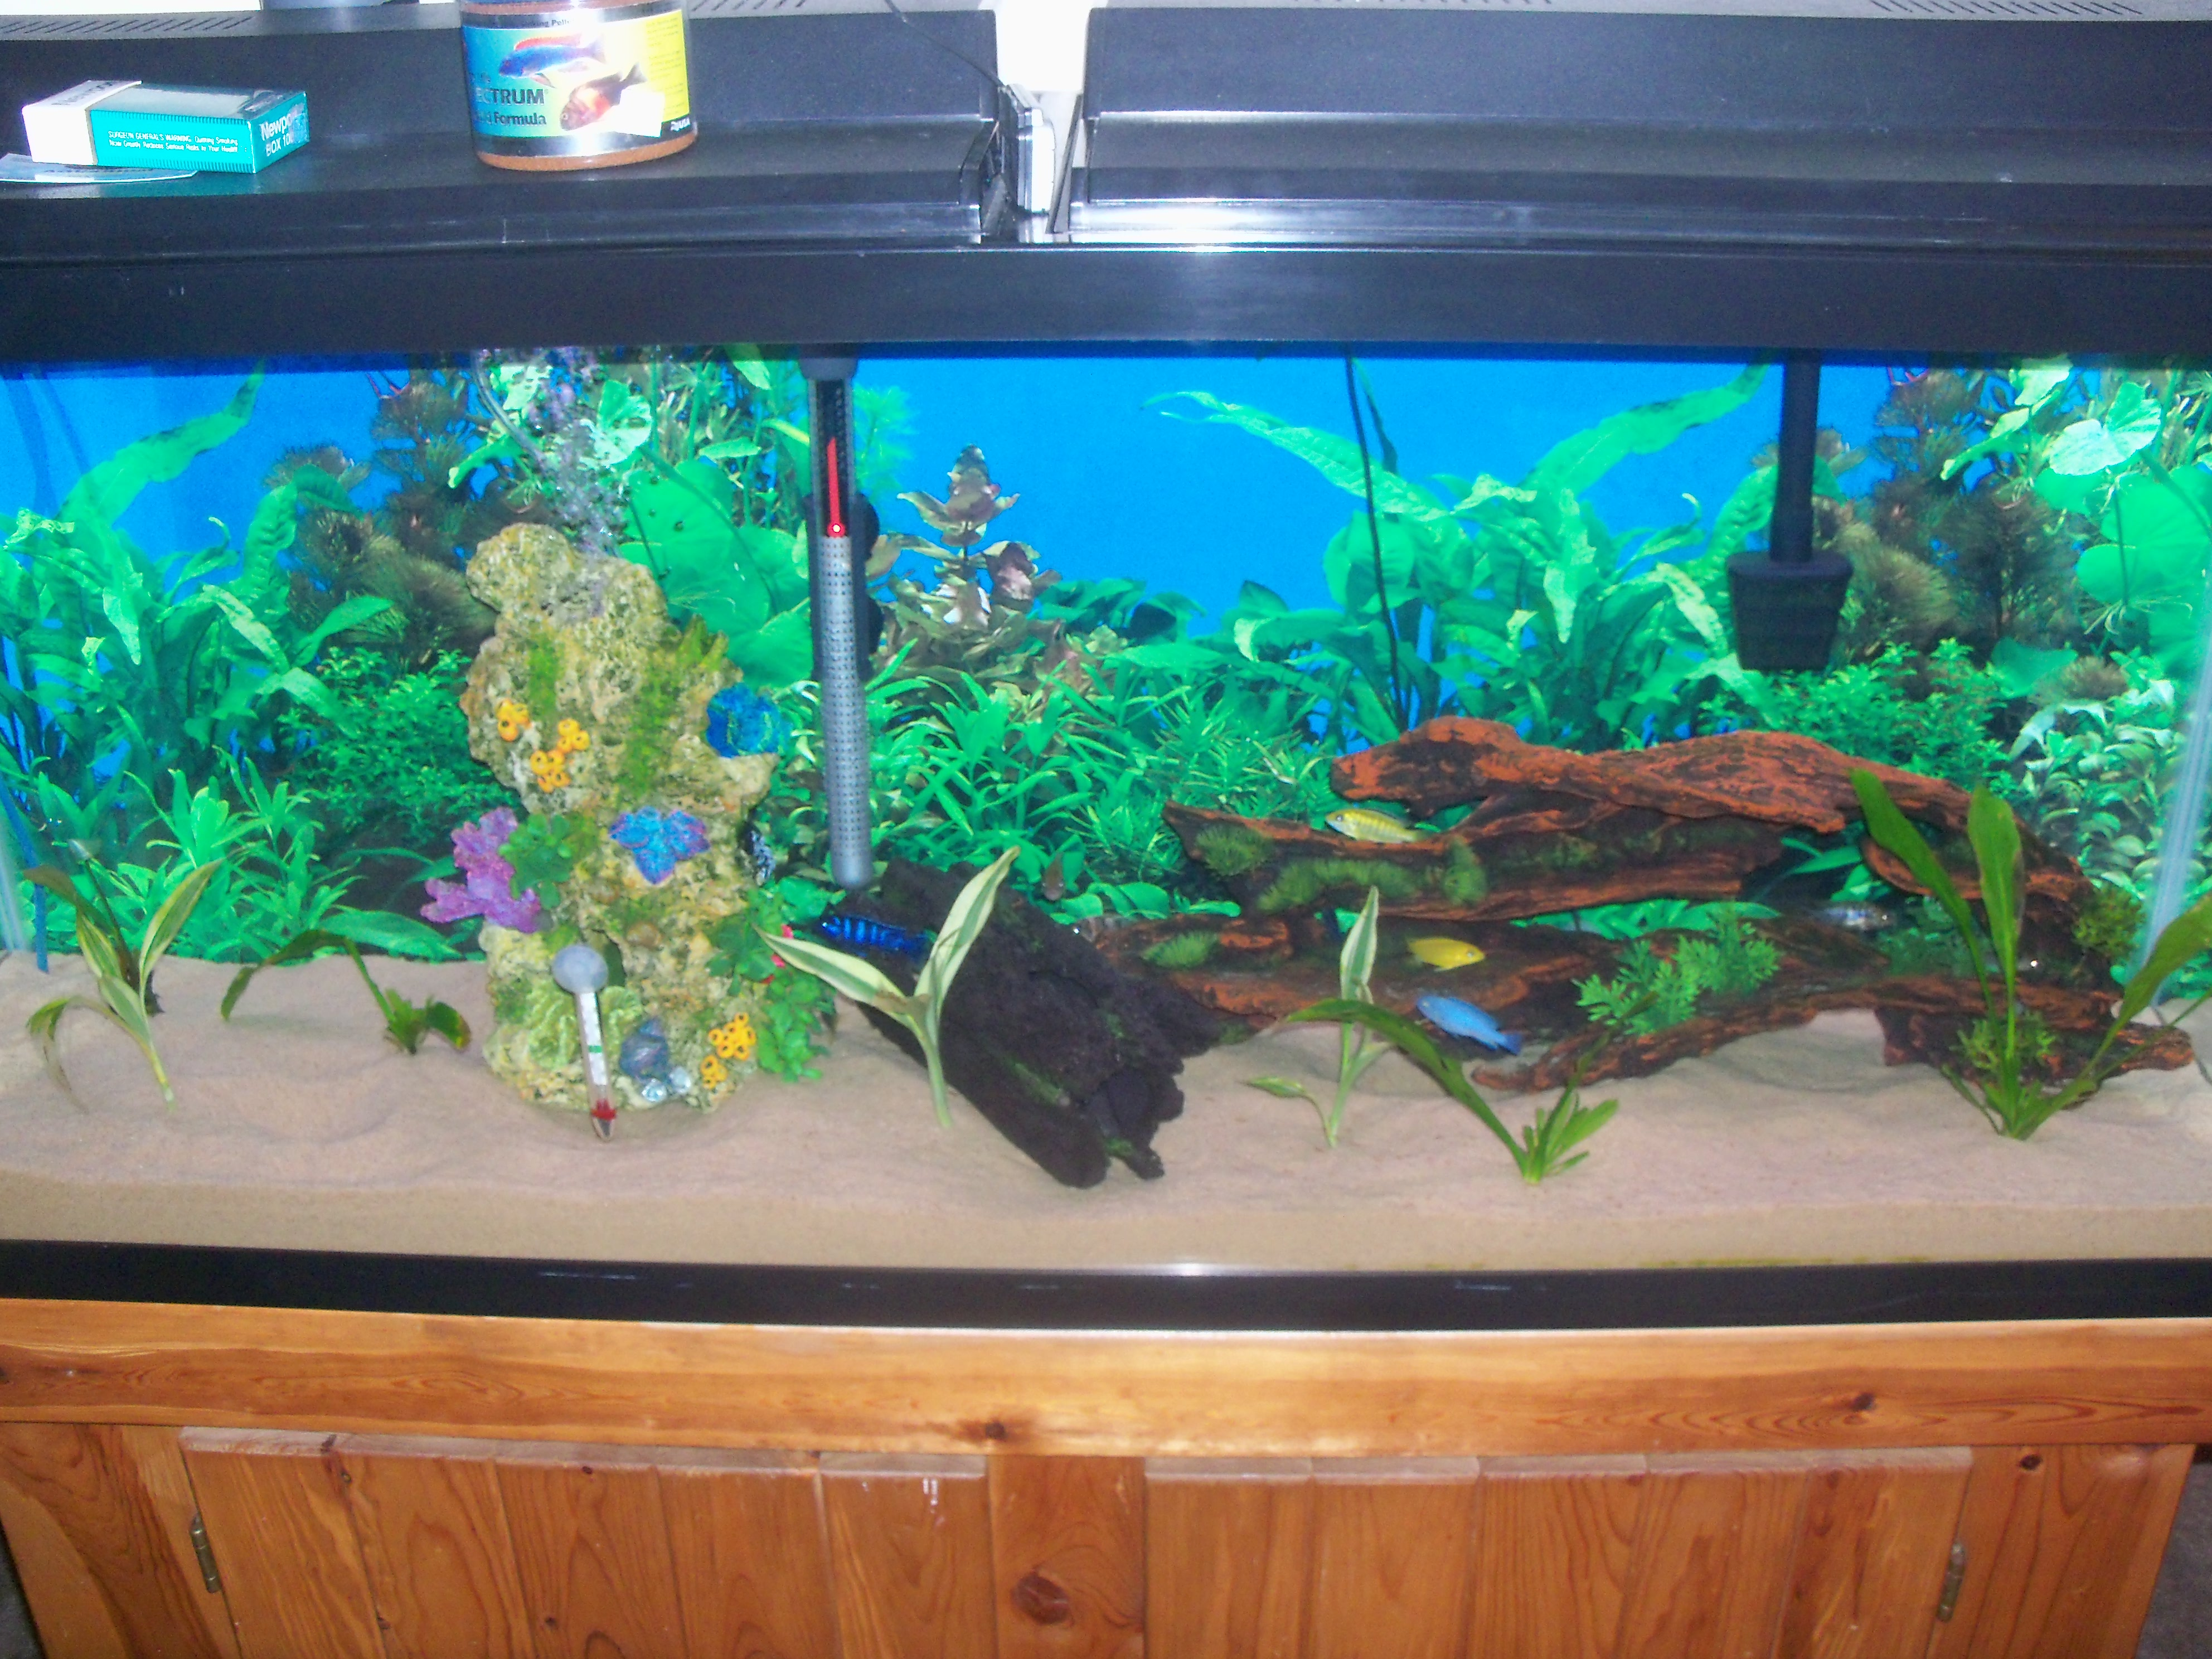 110 gallon aquarium glass fish reptile tank wholesale for 100 gallon fish tanks